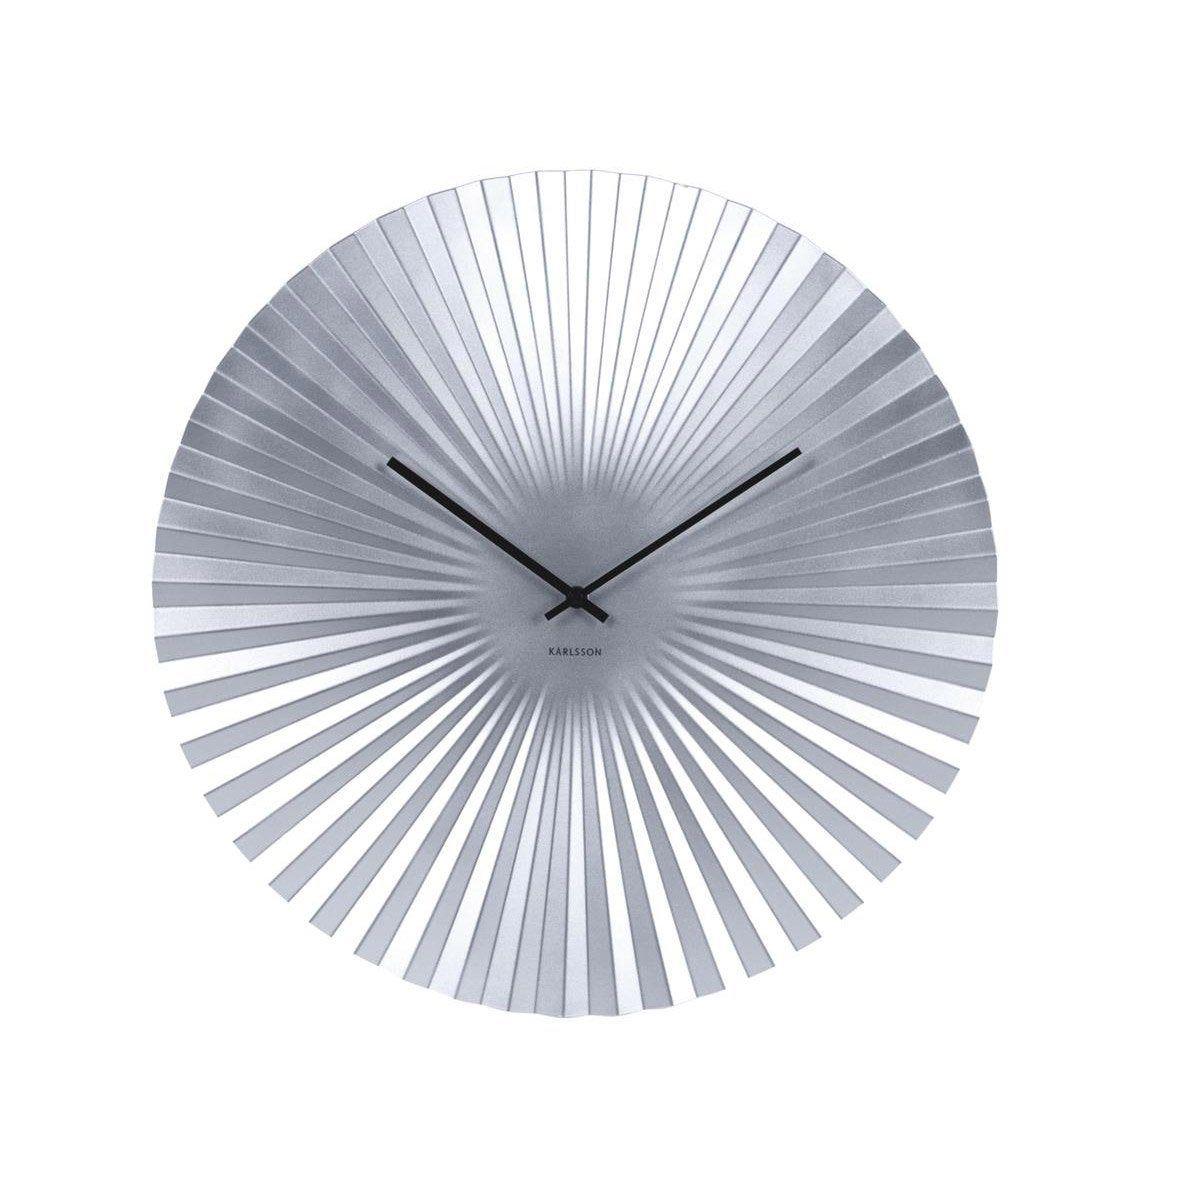 Horloge Sensu Ronde Silver Karlsson L50 X H50 Cm